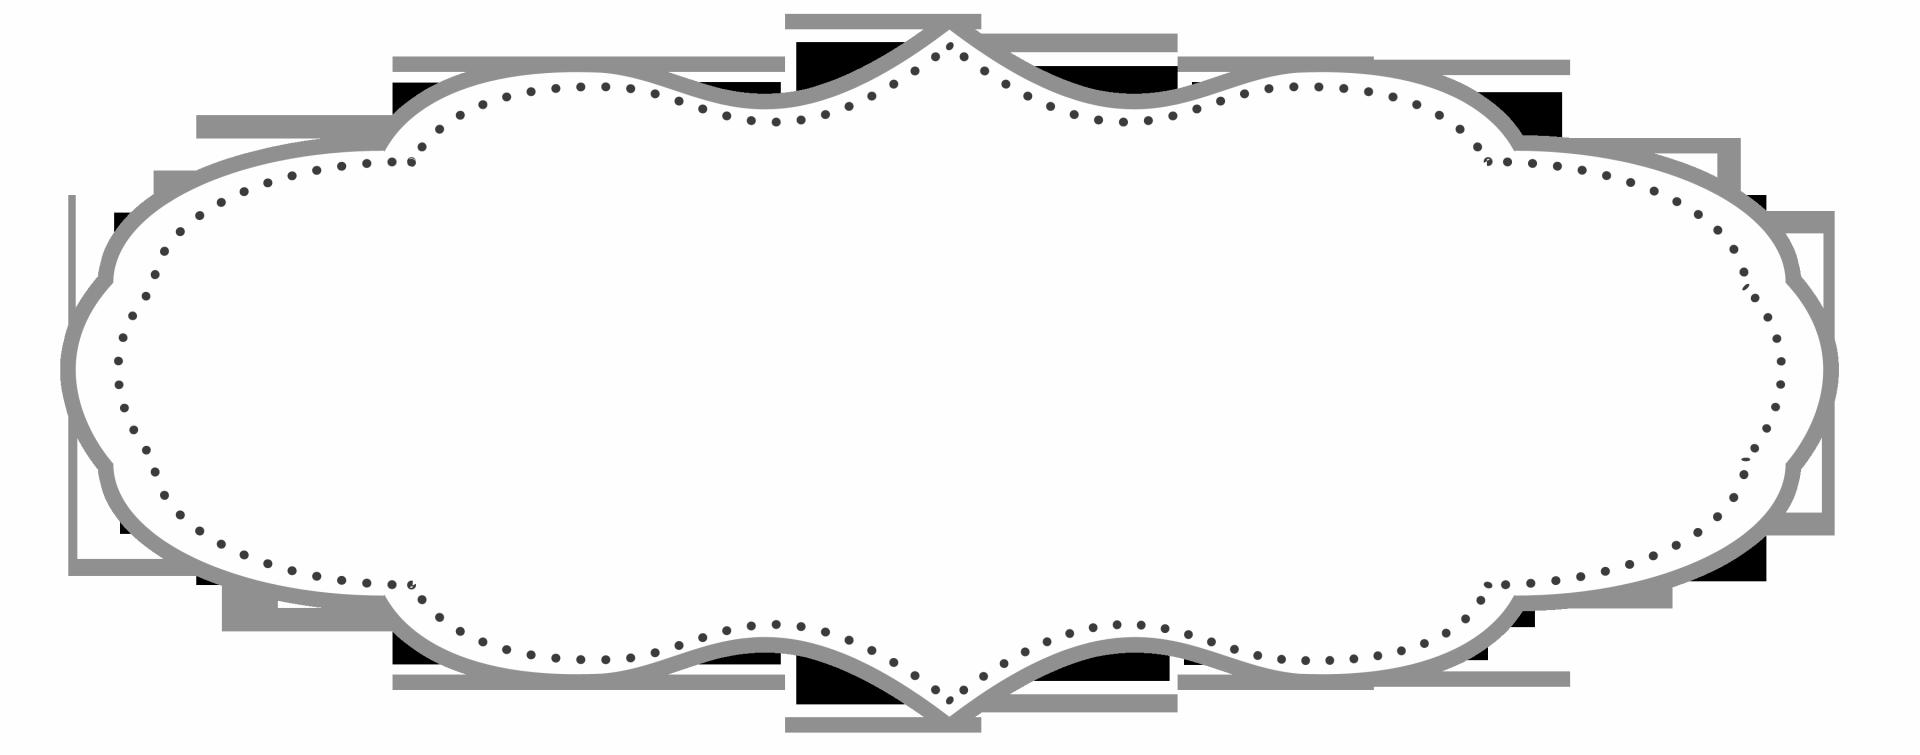 Pin En Web Design